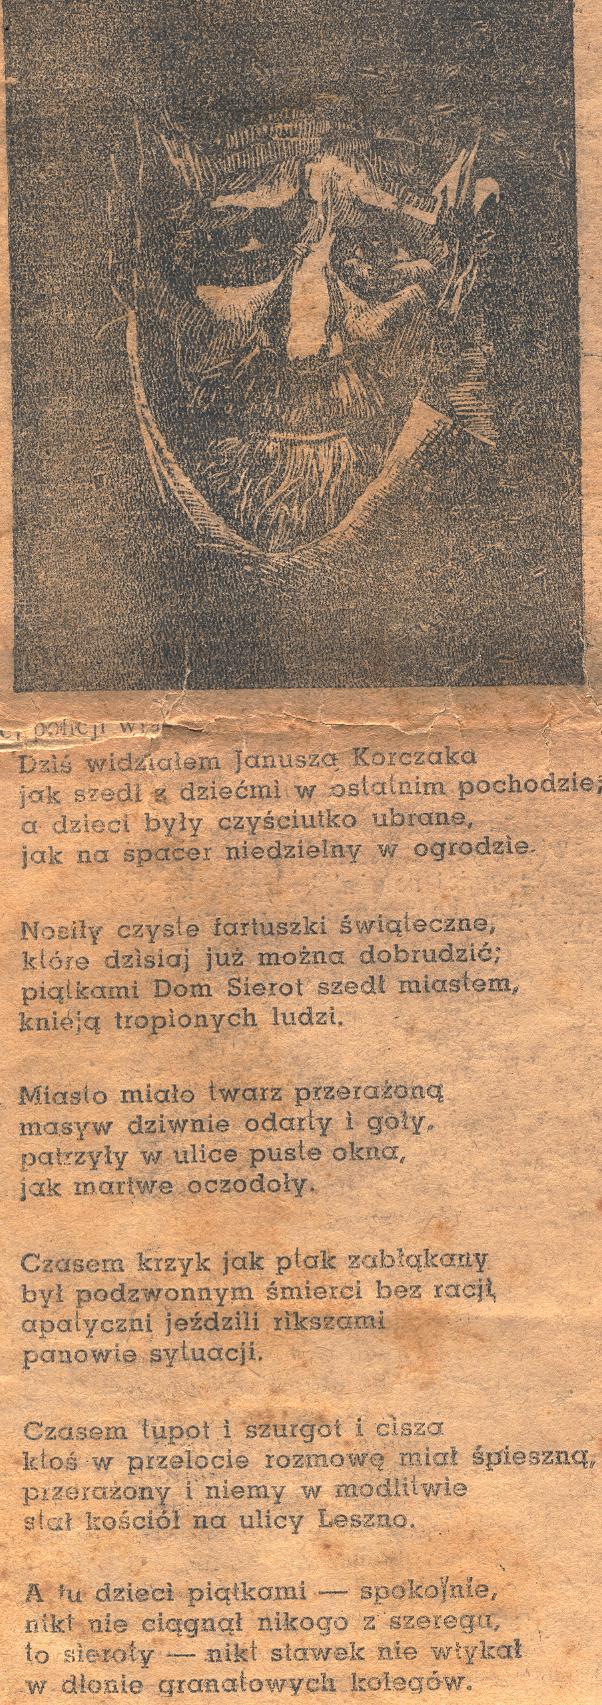 Wladyslaw Szlengel The Ghetto Poet